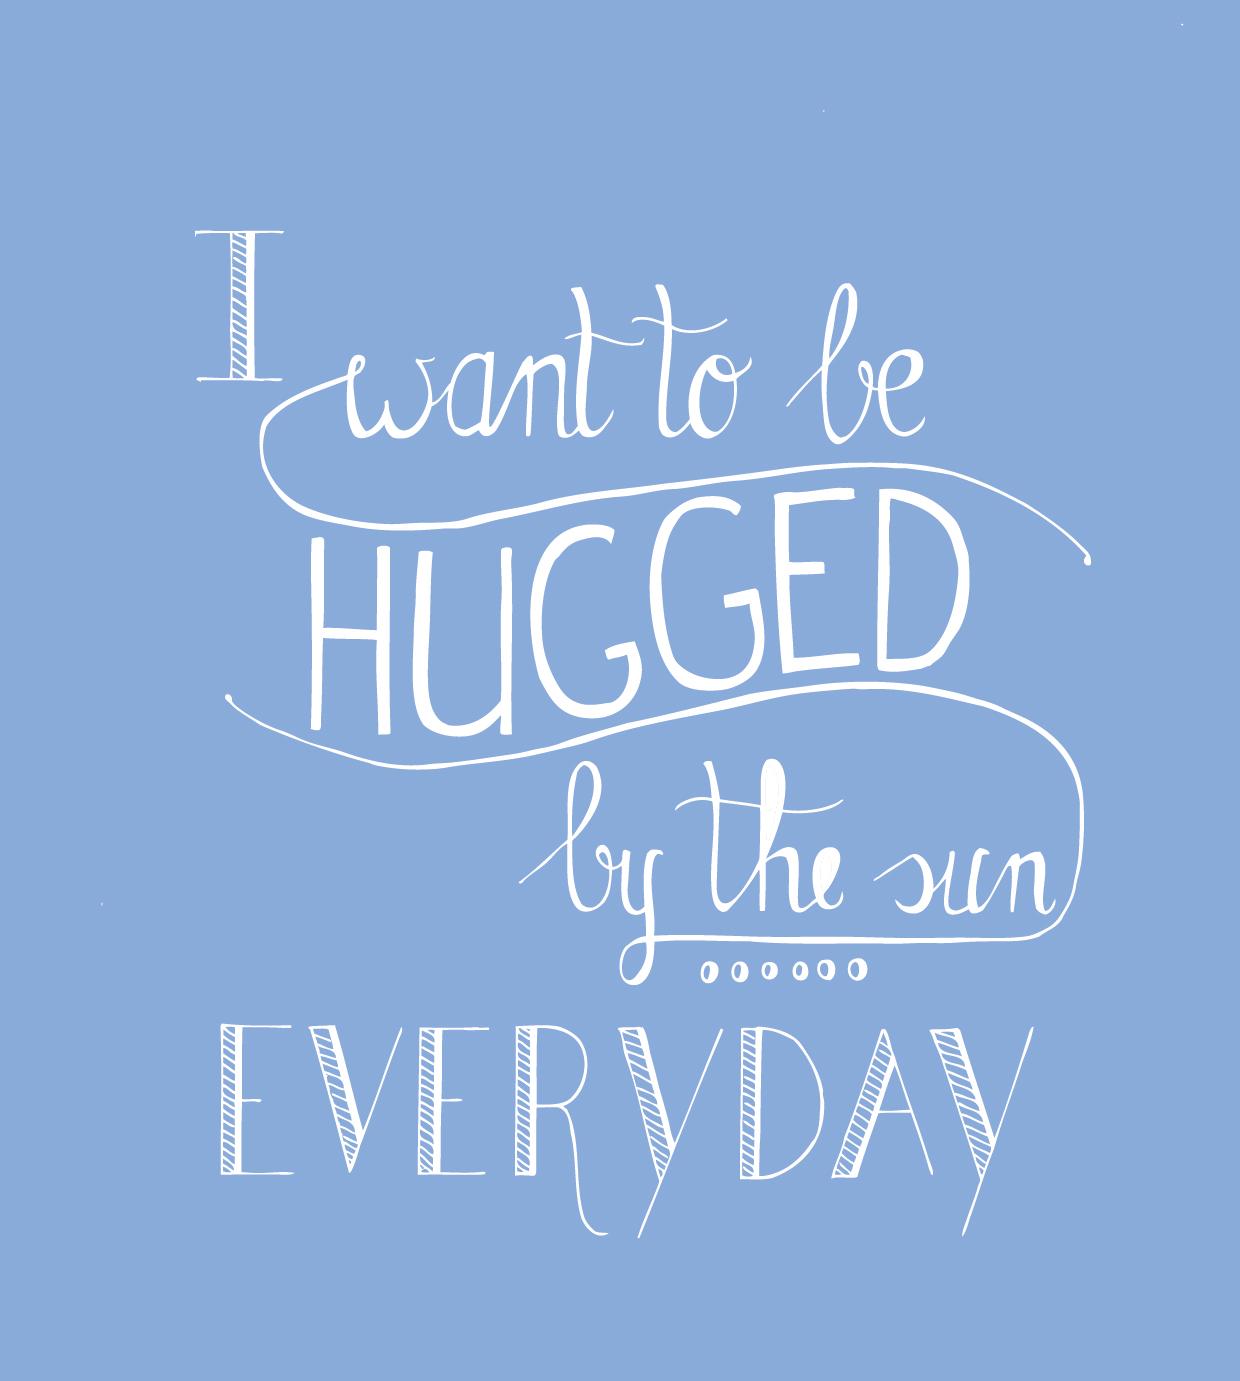 hugged.jpg